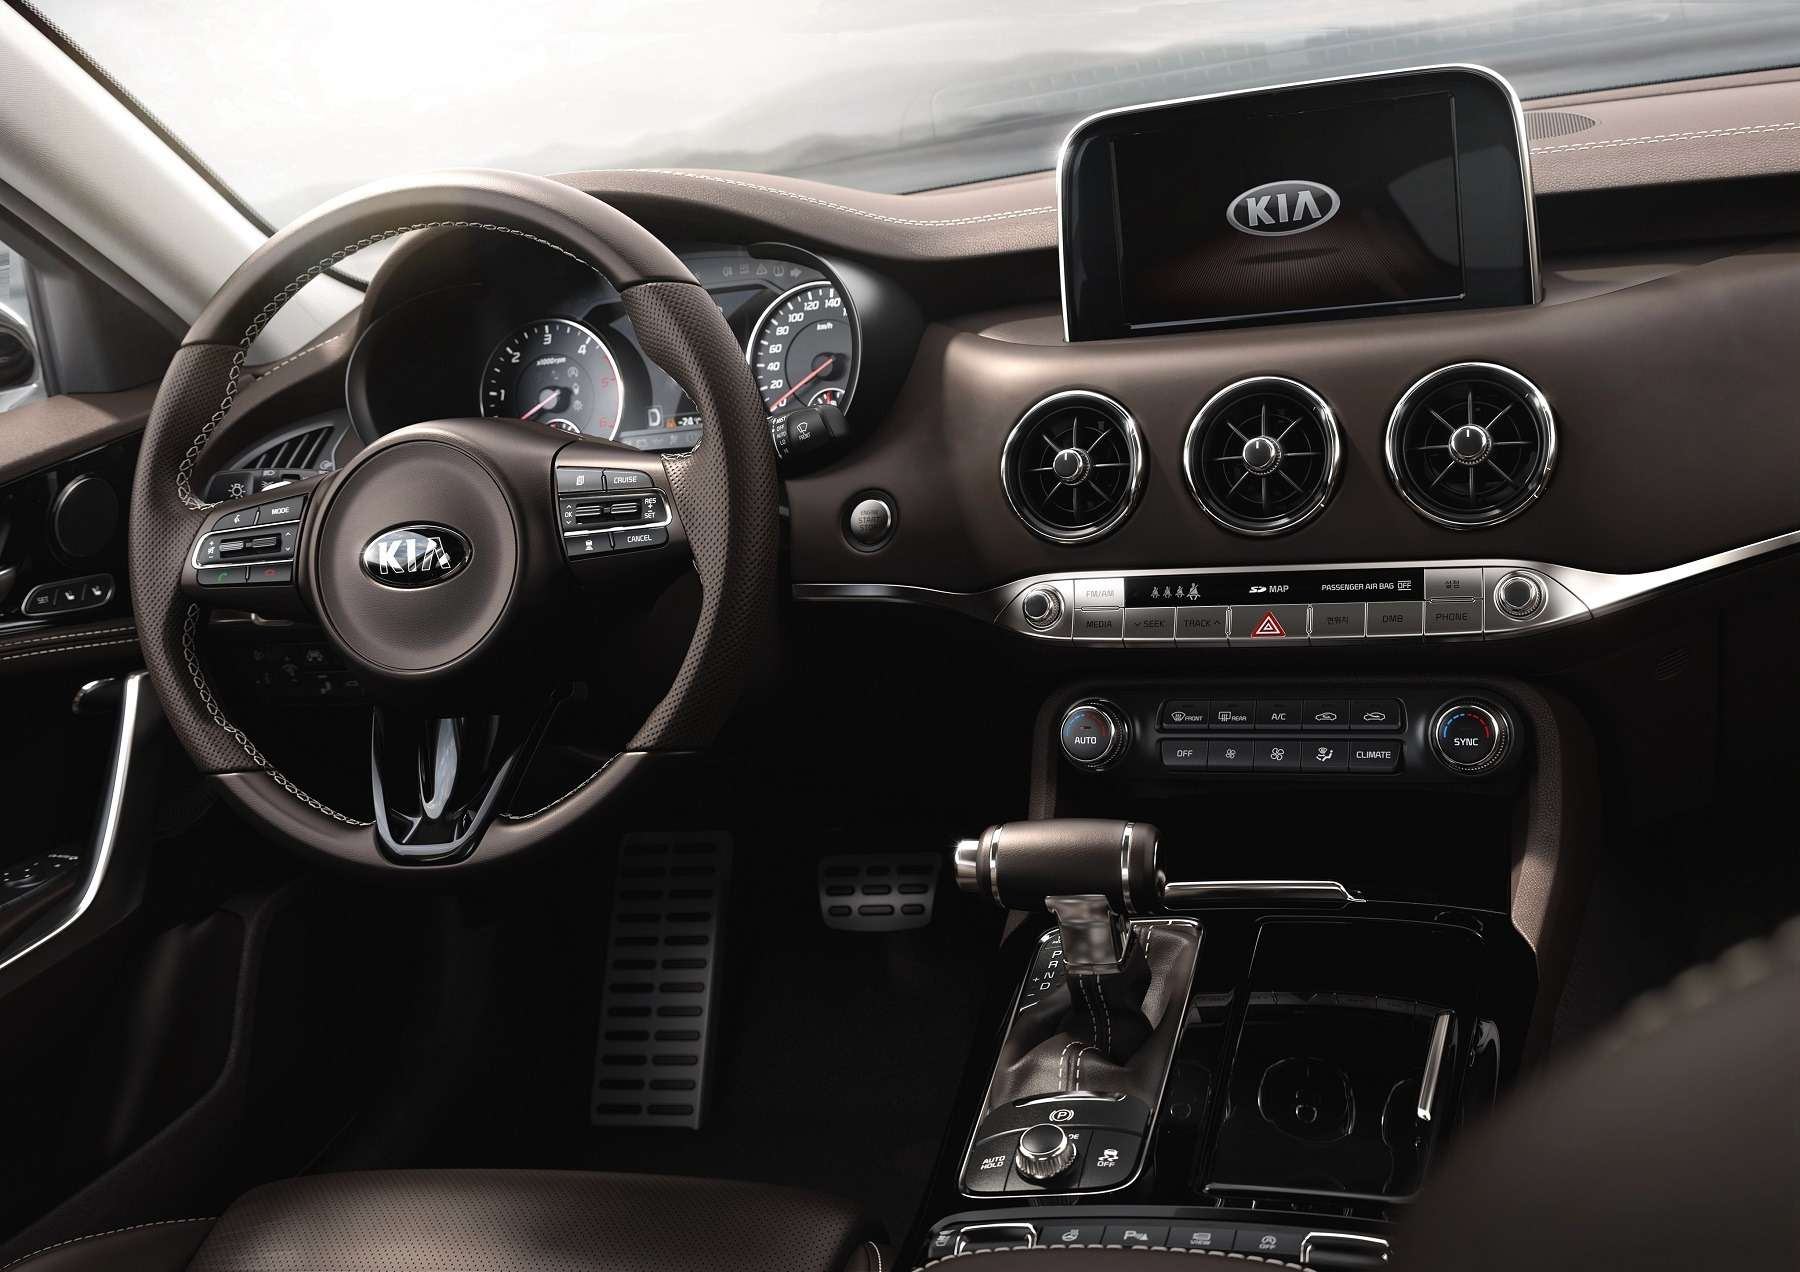 Stinger запущен: Kia показала разрекламированный спорткар— фото 689975